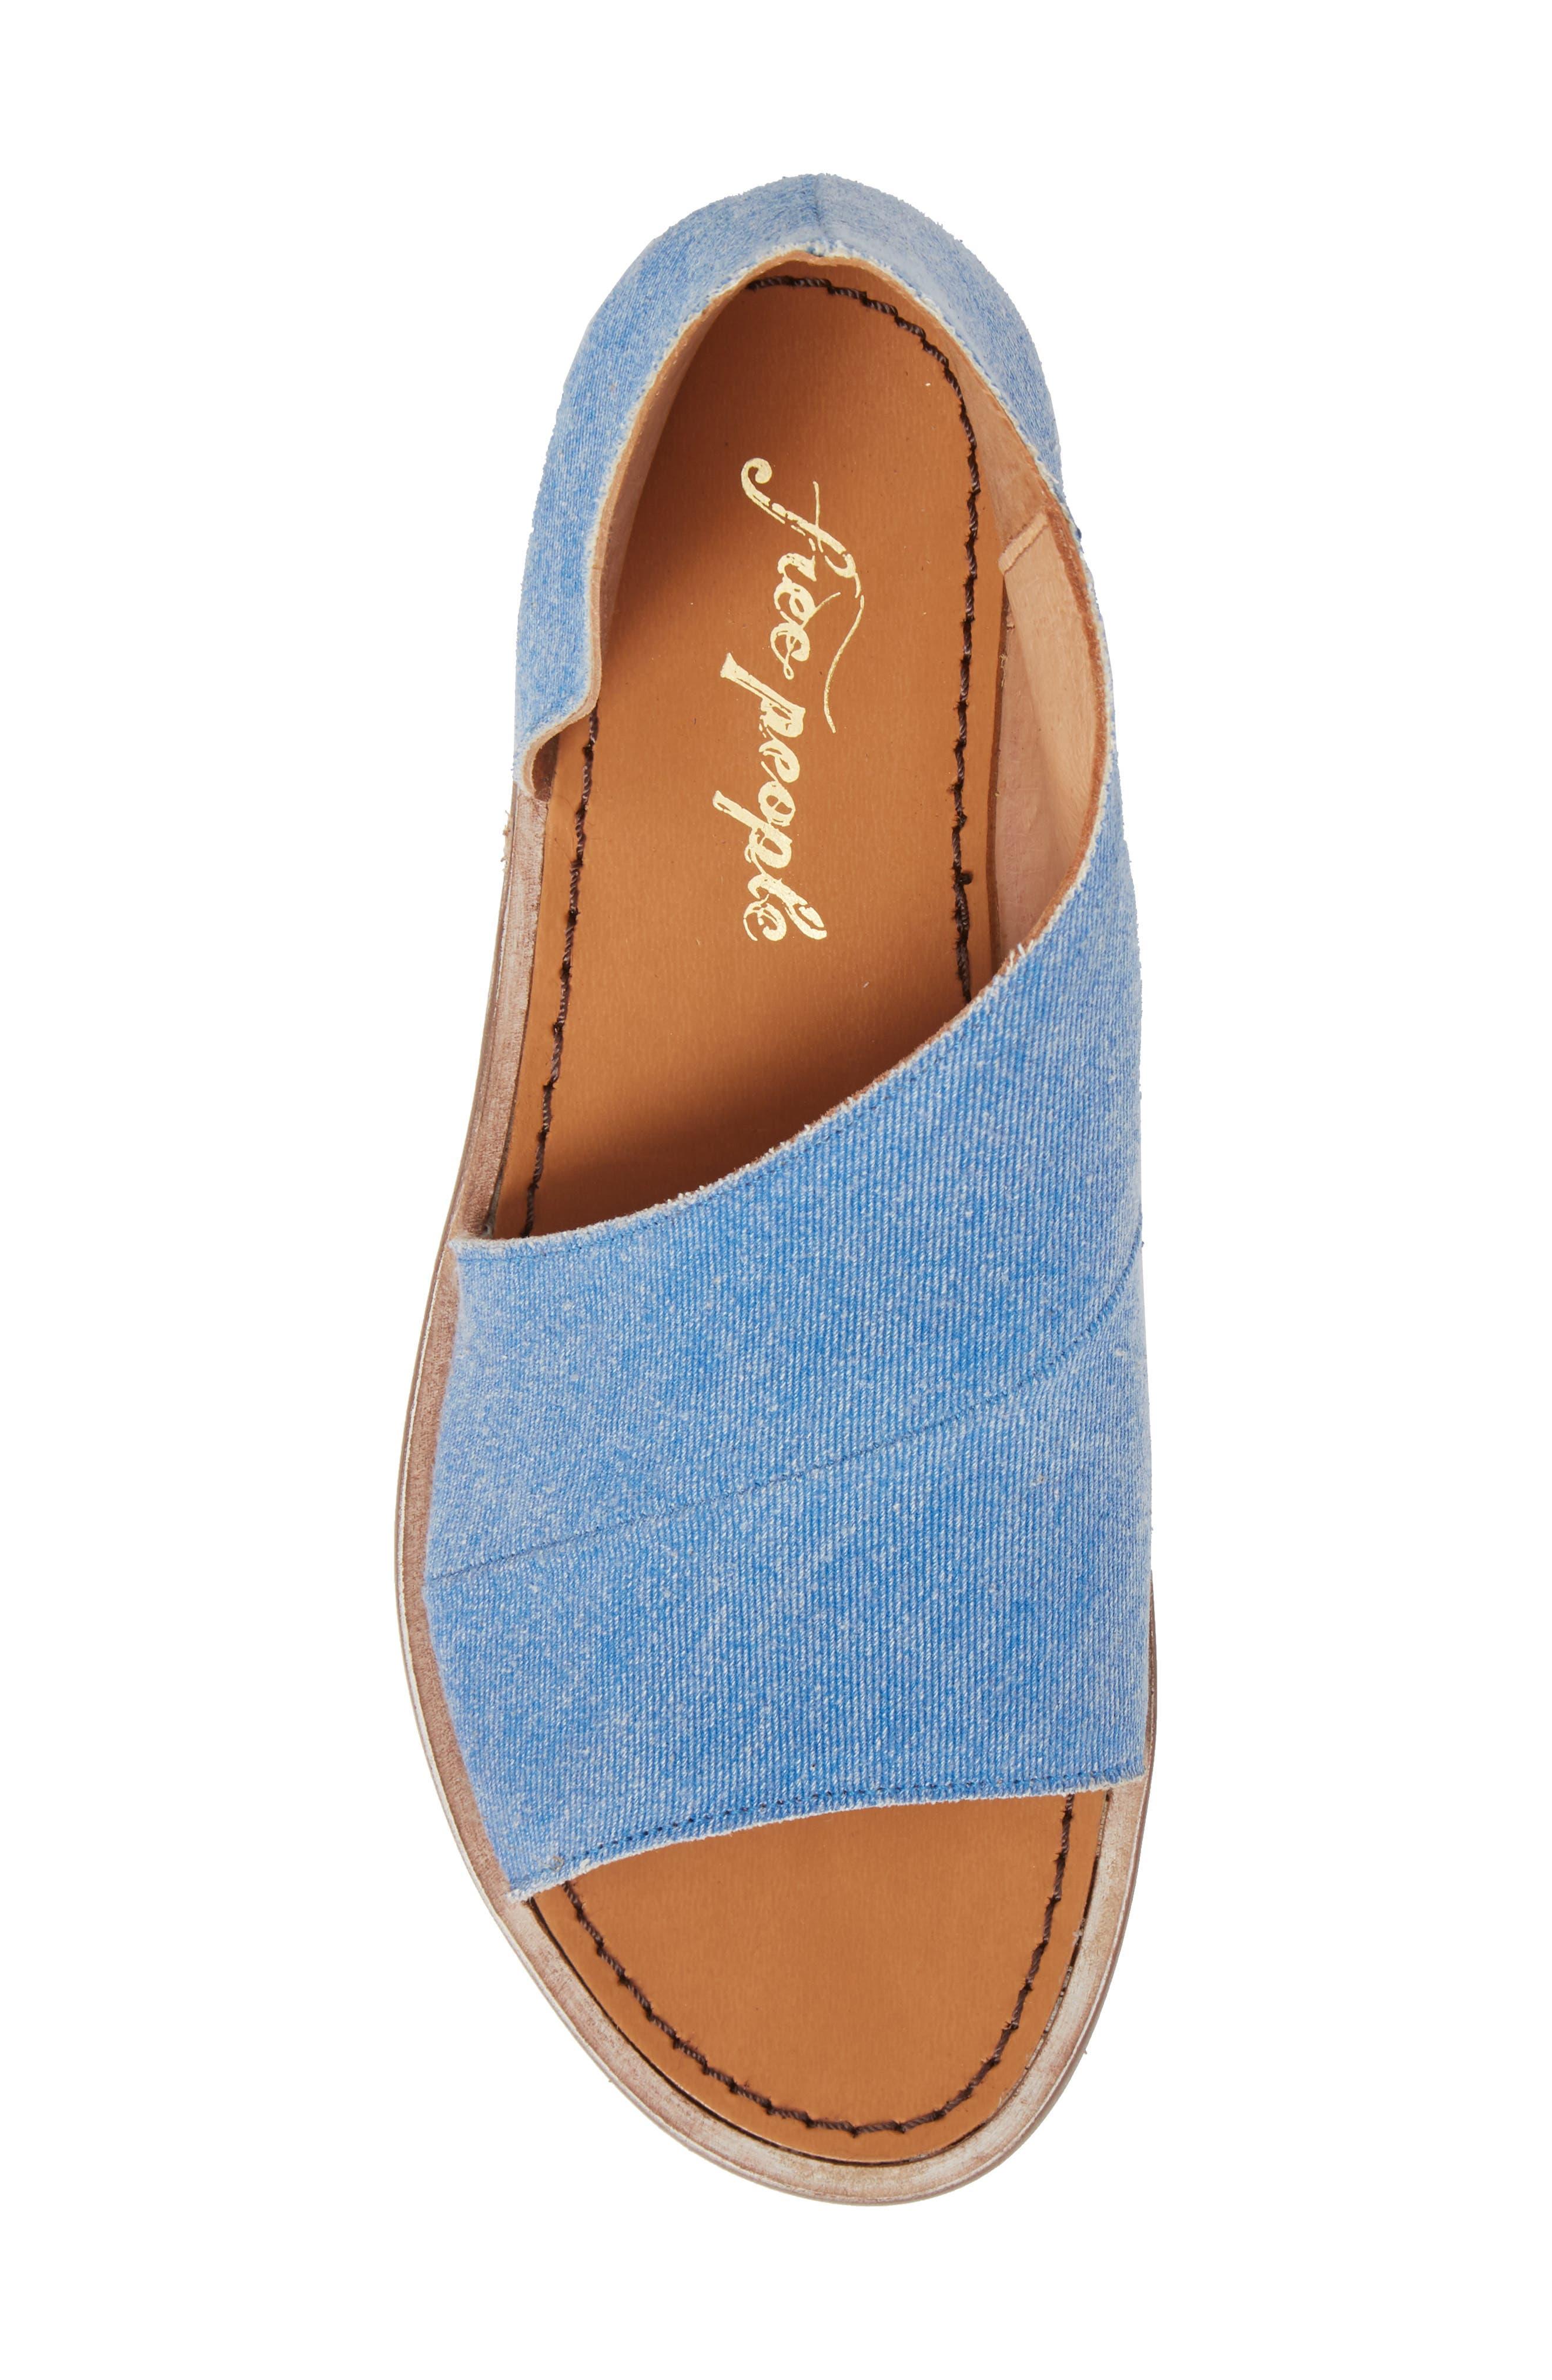 'Mont Blanc' Asymmetrical Sandal,                             Alternate thumbnail 57, color,